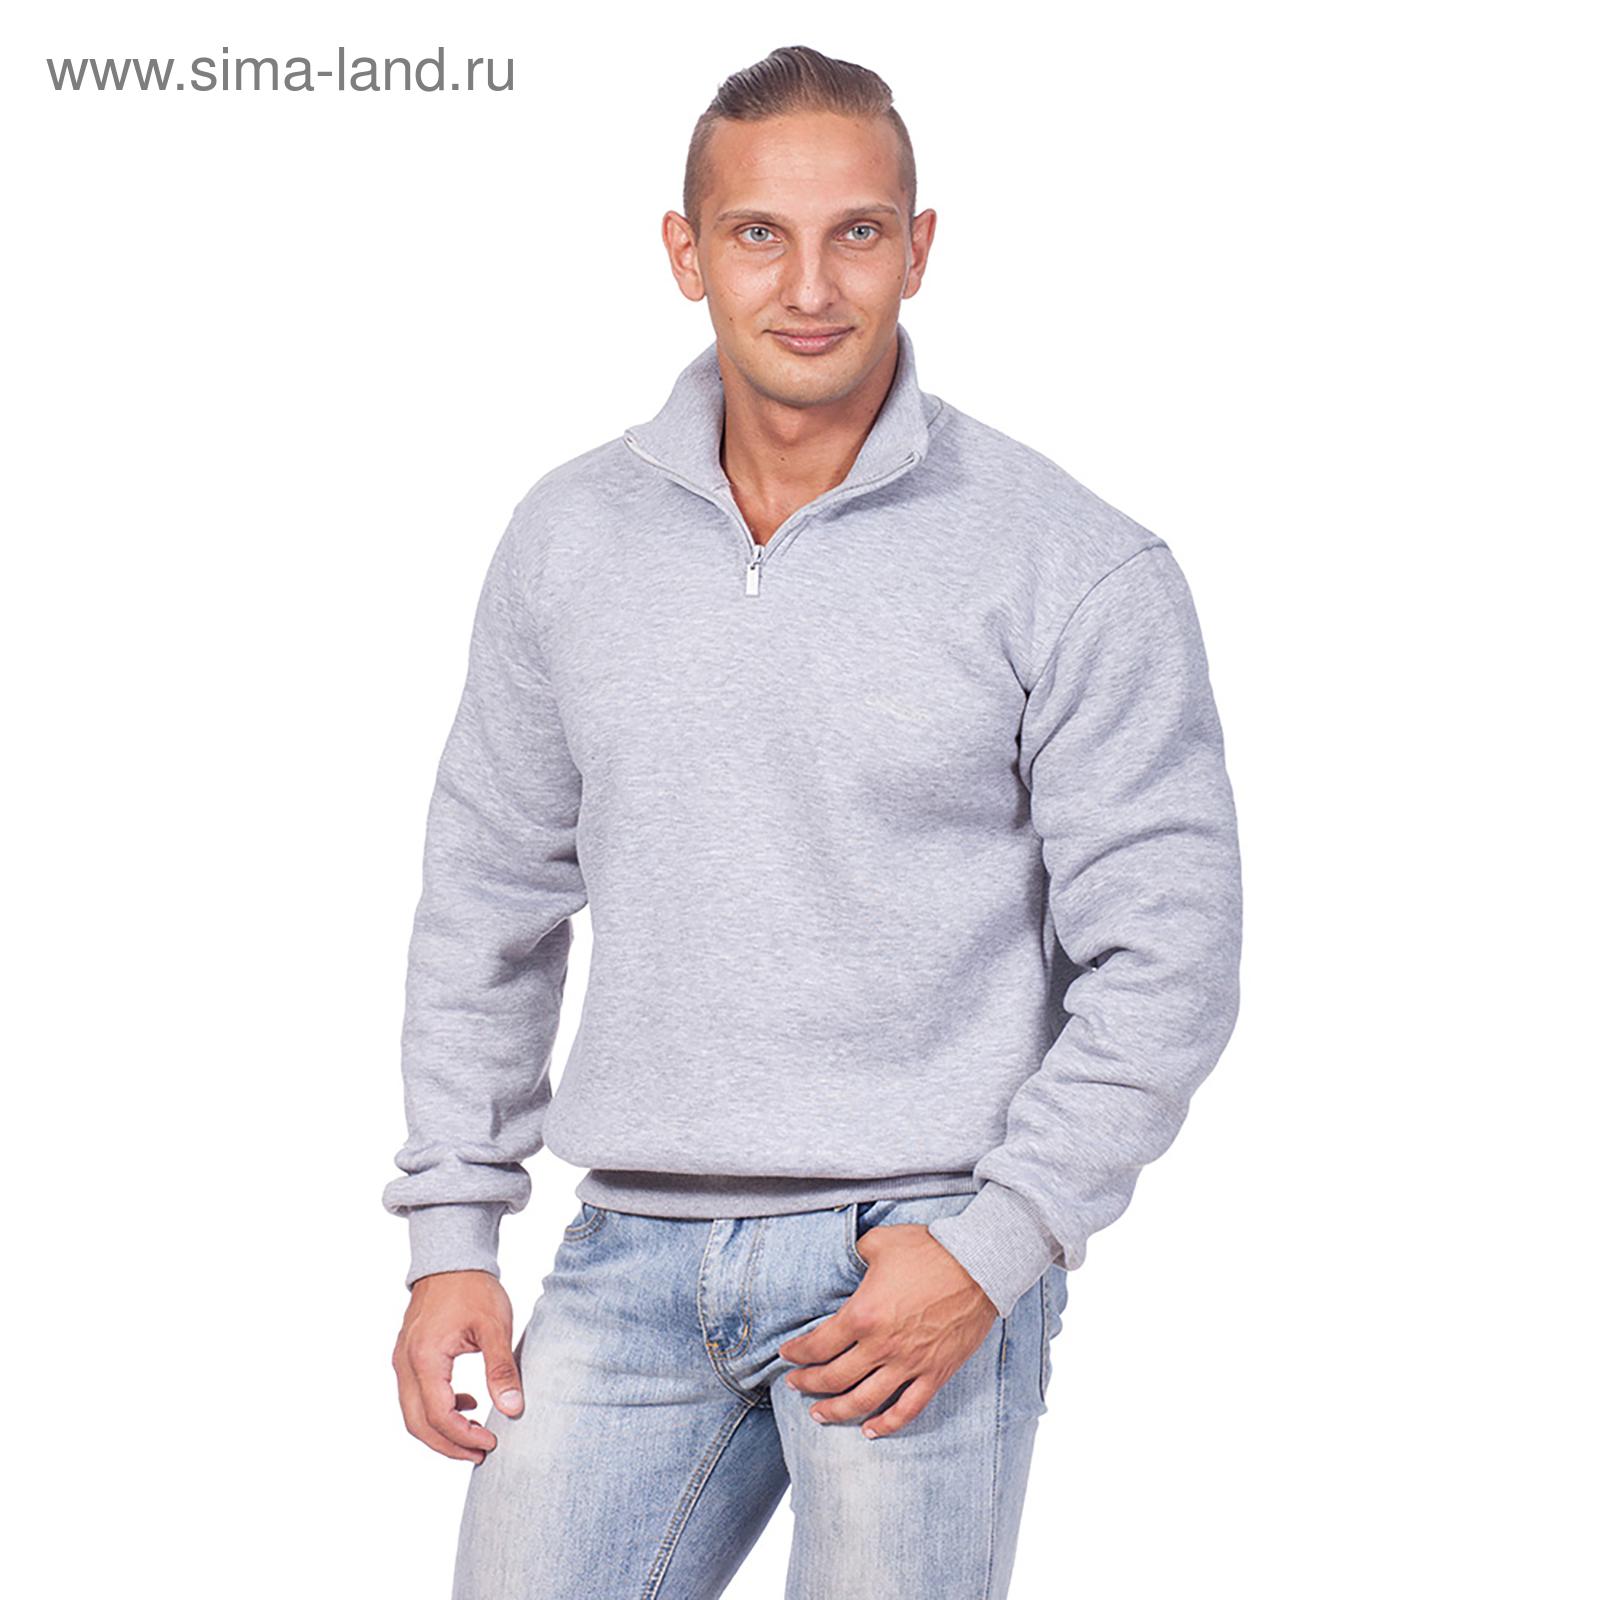 0afea62982a47 Толстовка мужская на короткой молнии, цвет серый меланж, размер 50 (L)